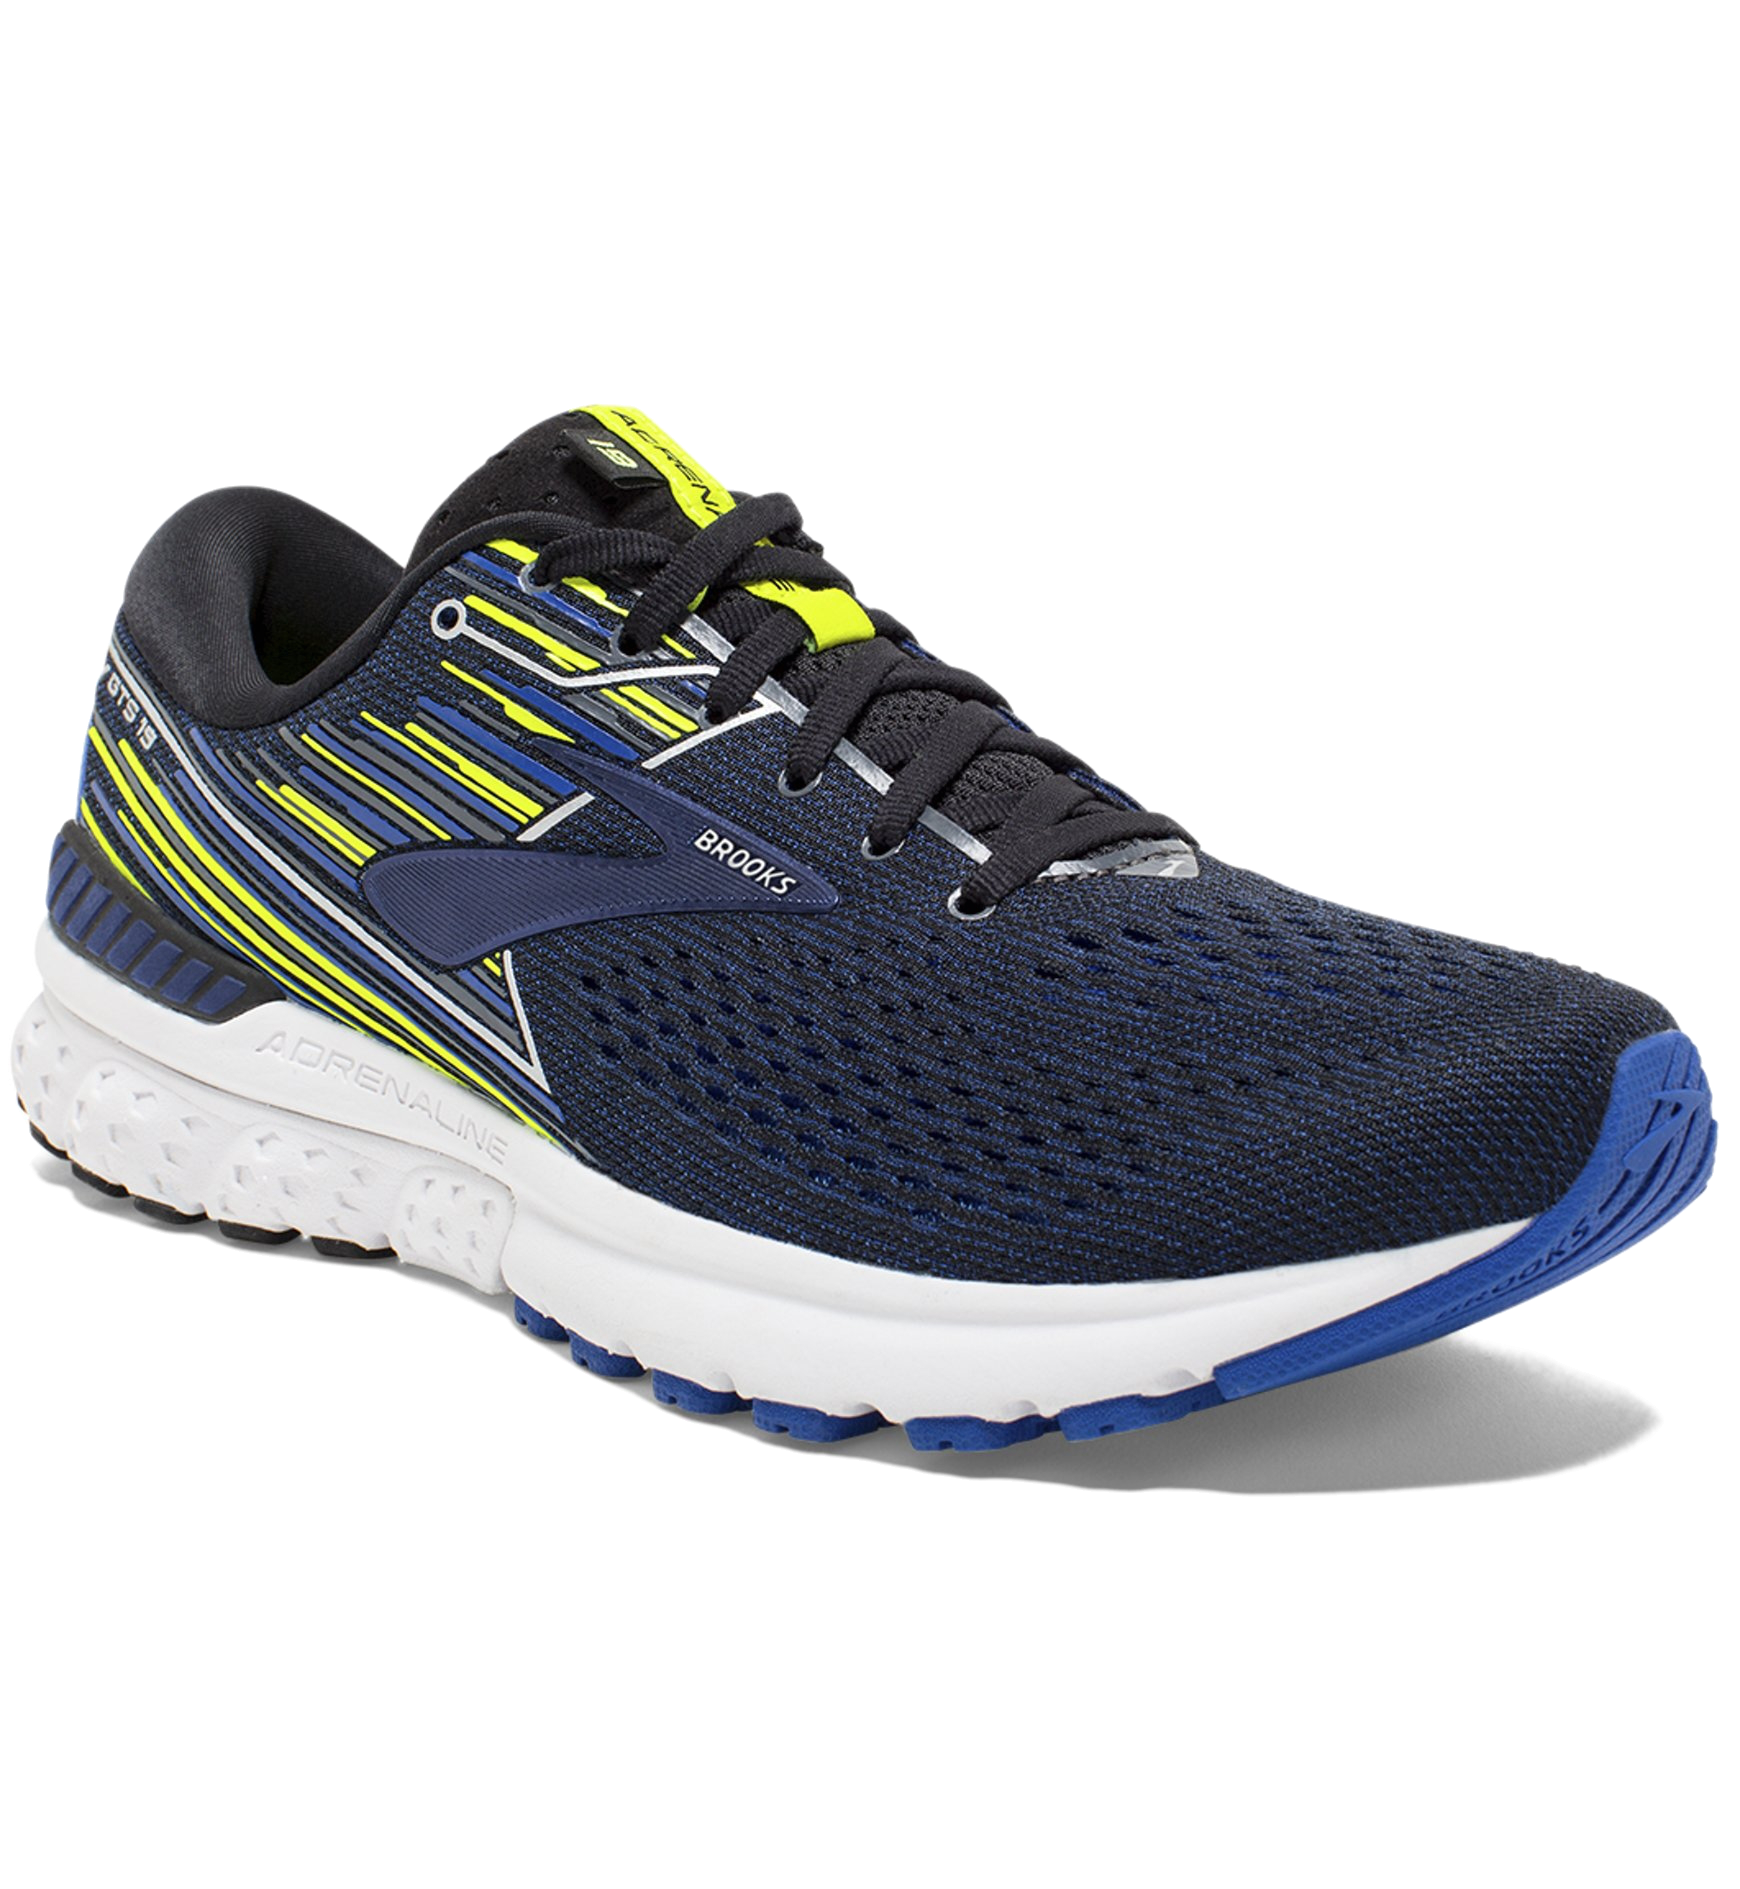 Adrenaline GTS 19 Brooks – Stabilitäts-Laufschuh – Herrenmodell